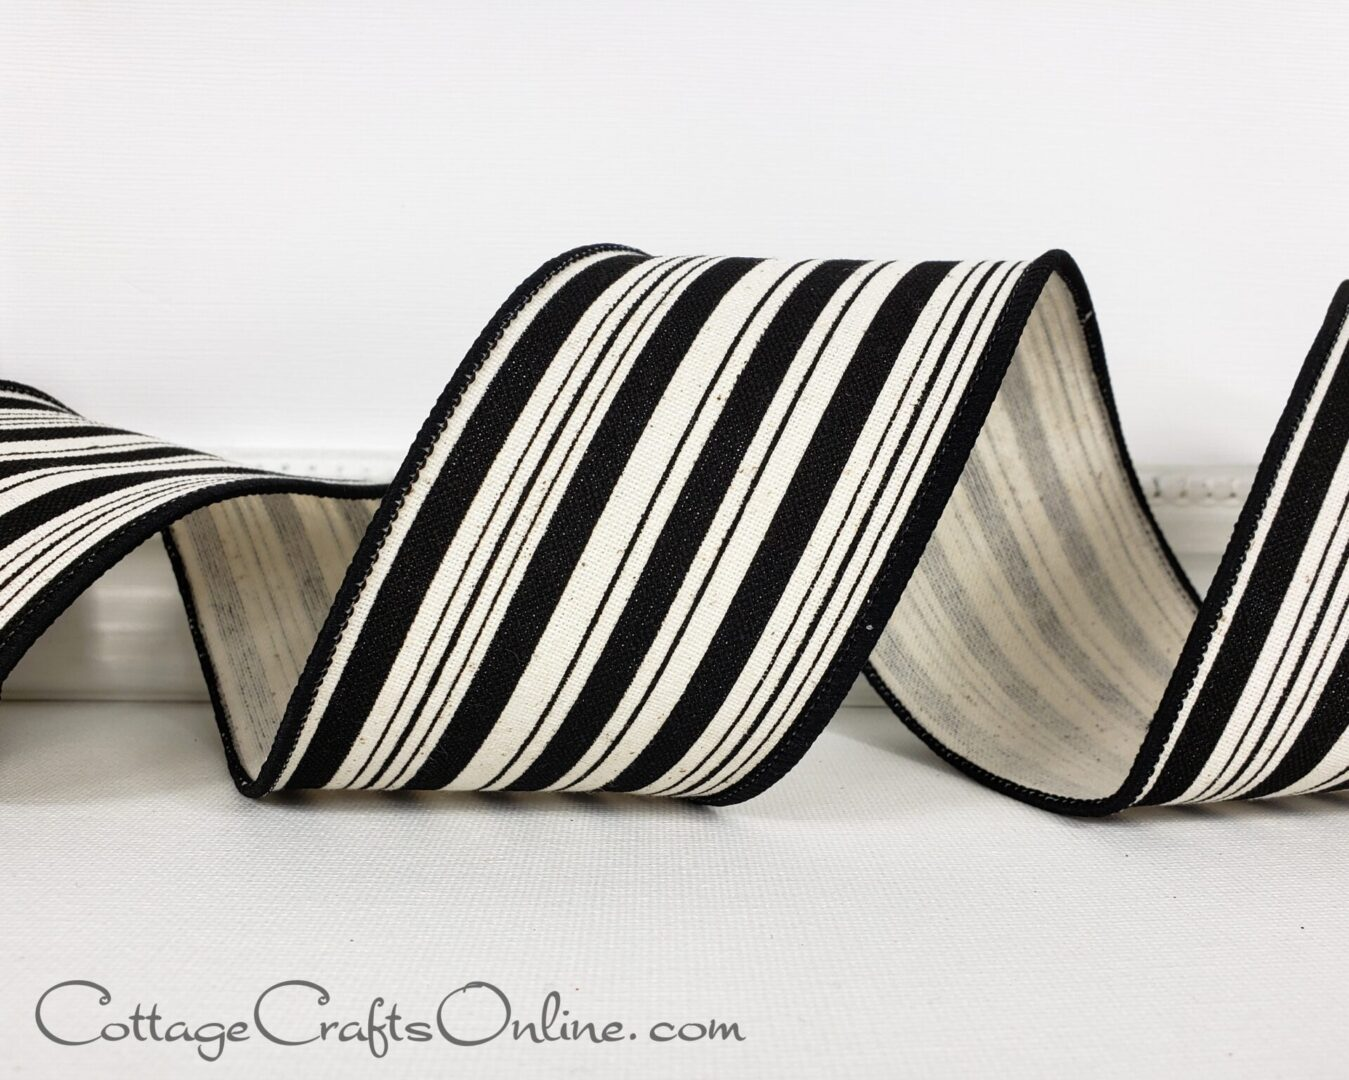 vern black natural stripe off white cb rg c 150 3c2-005